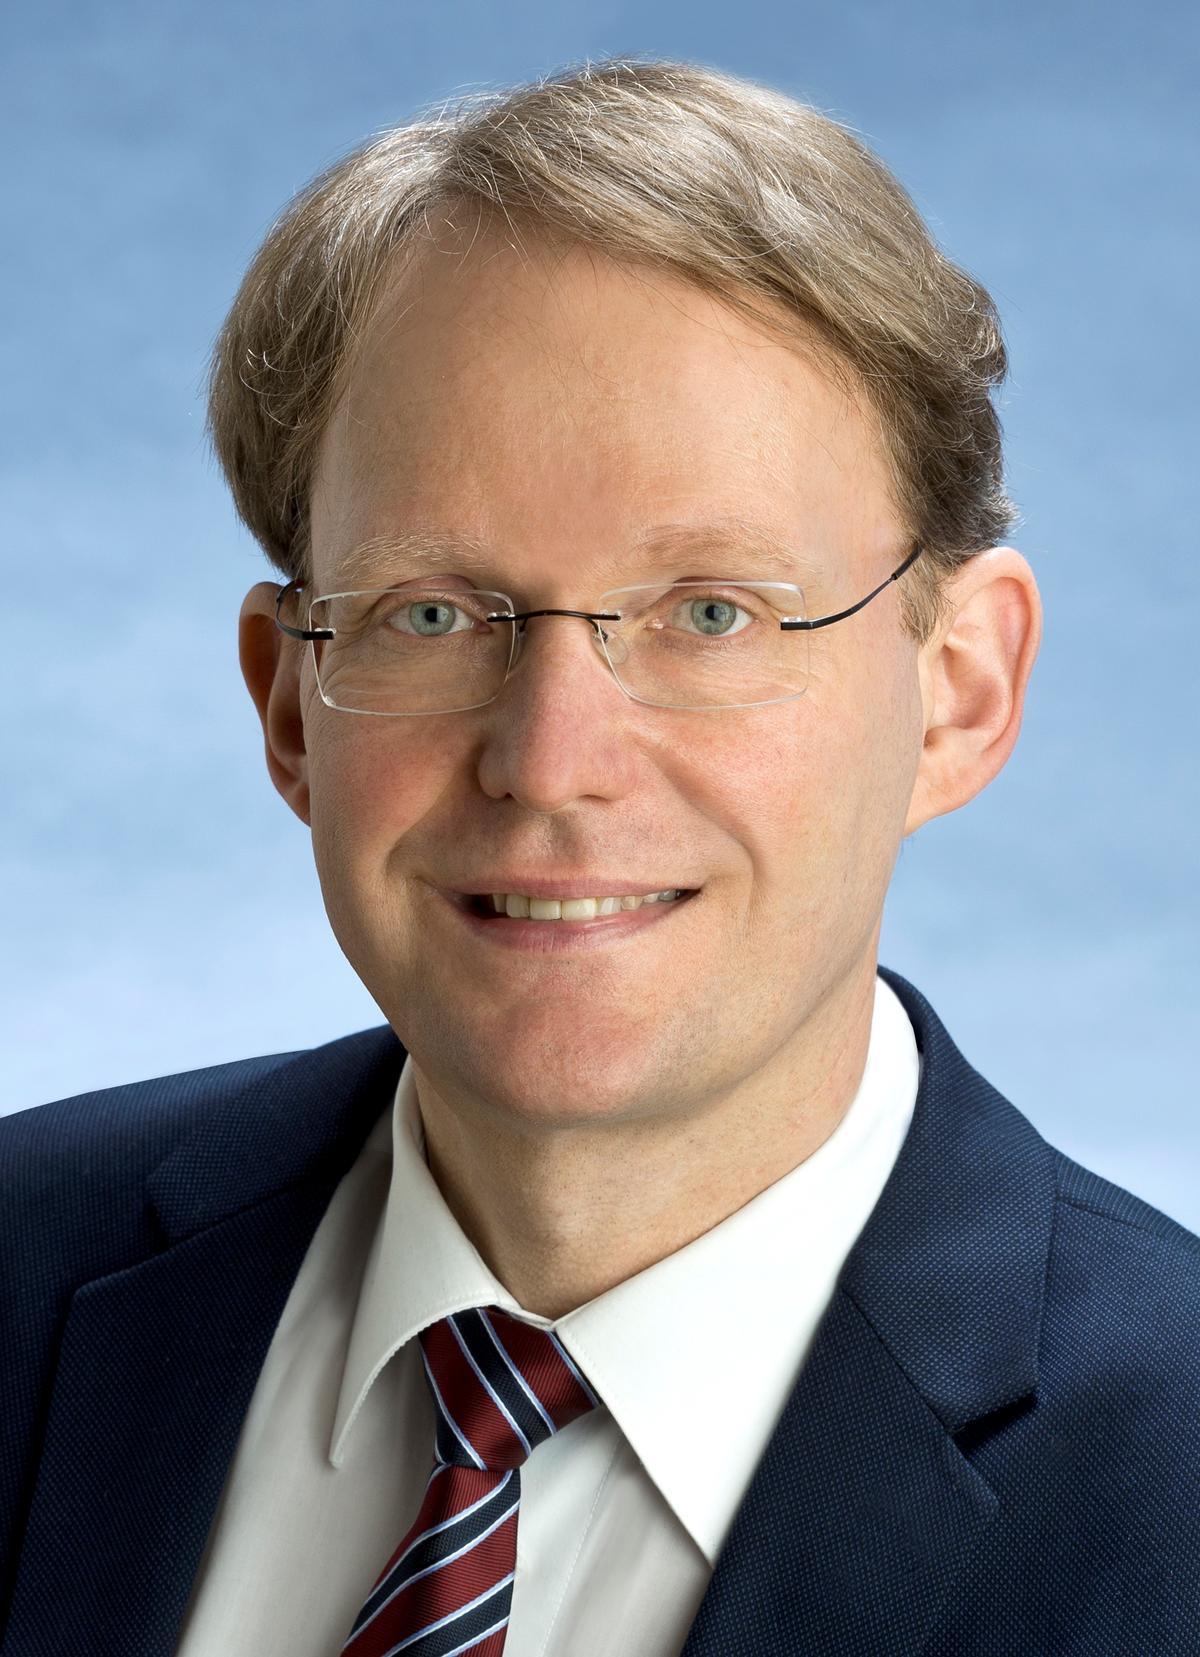 Bürgermeister Gevelsberg